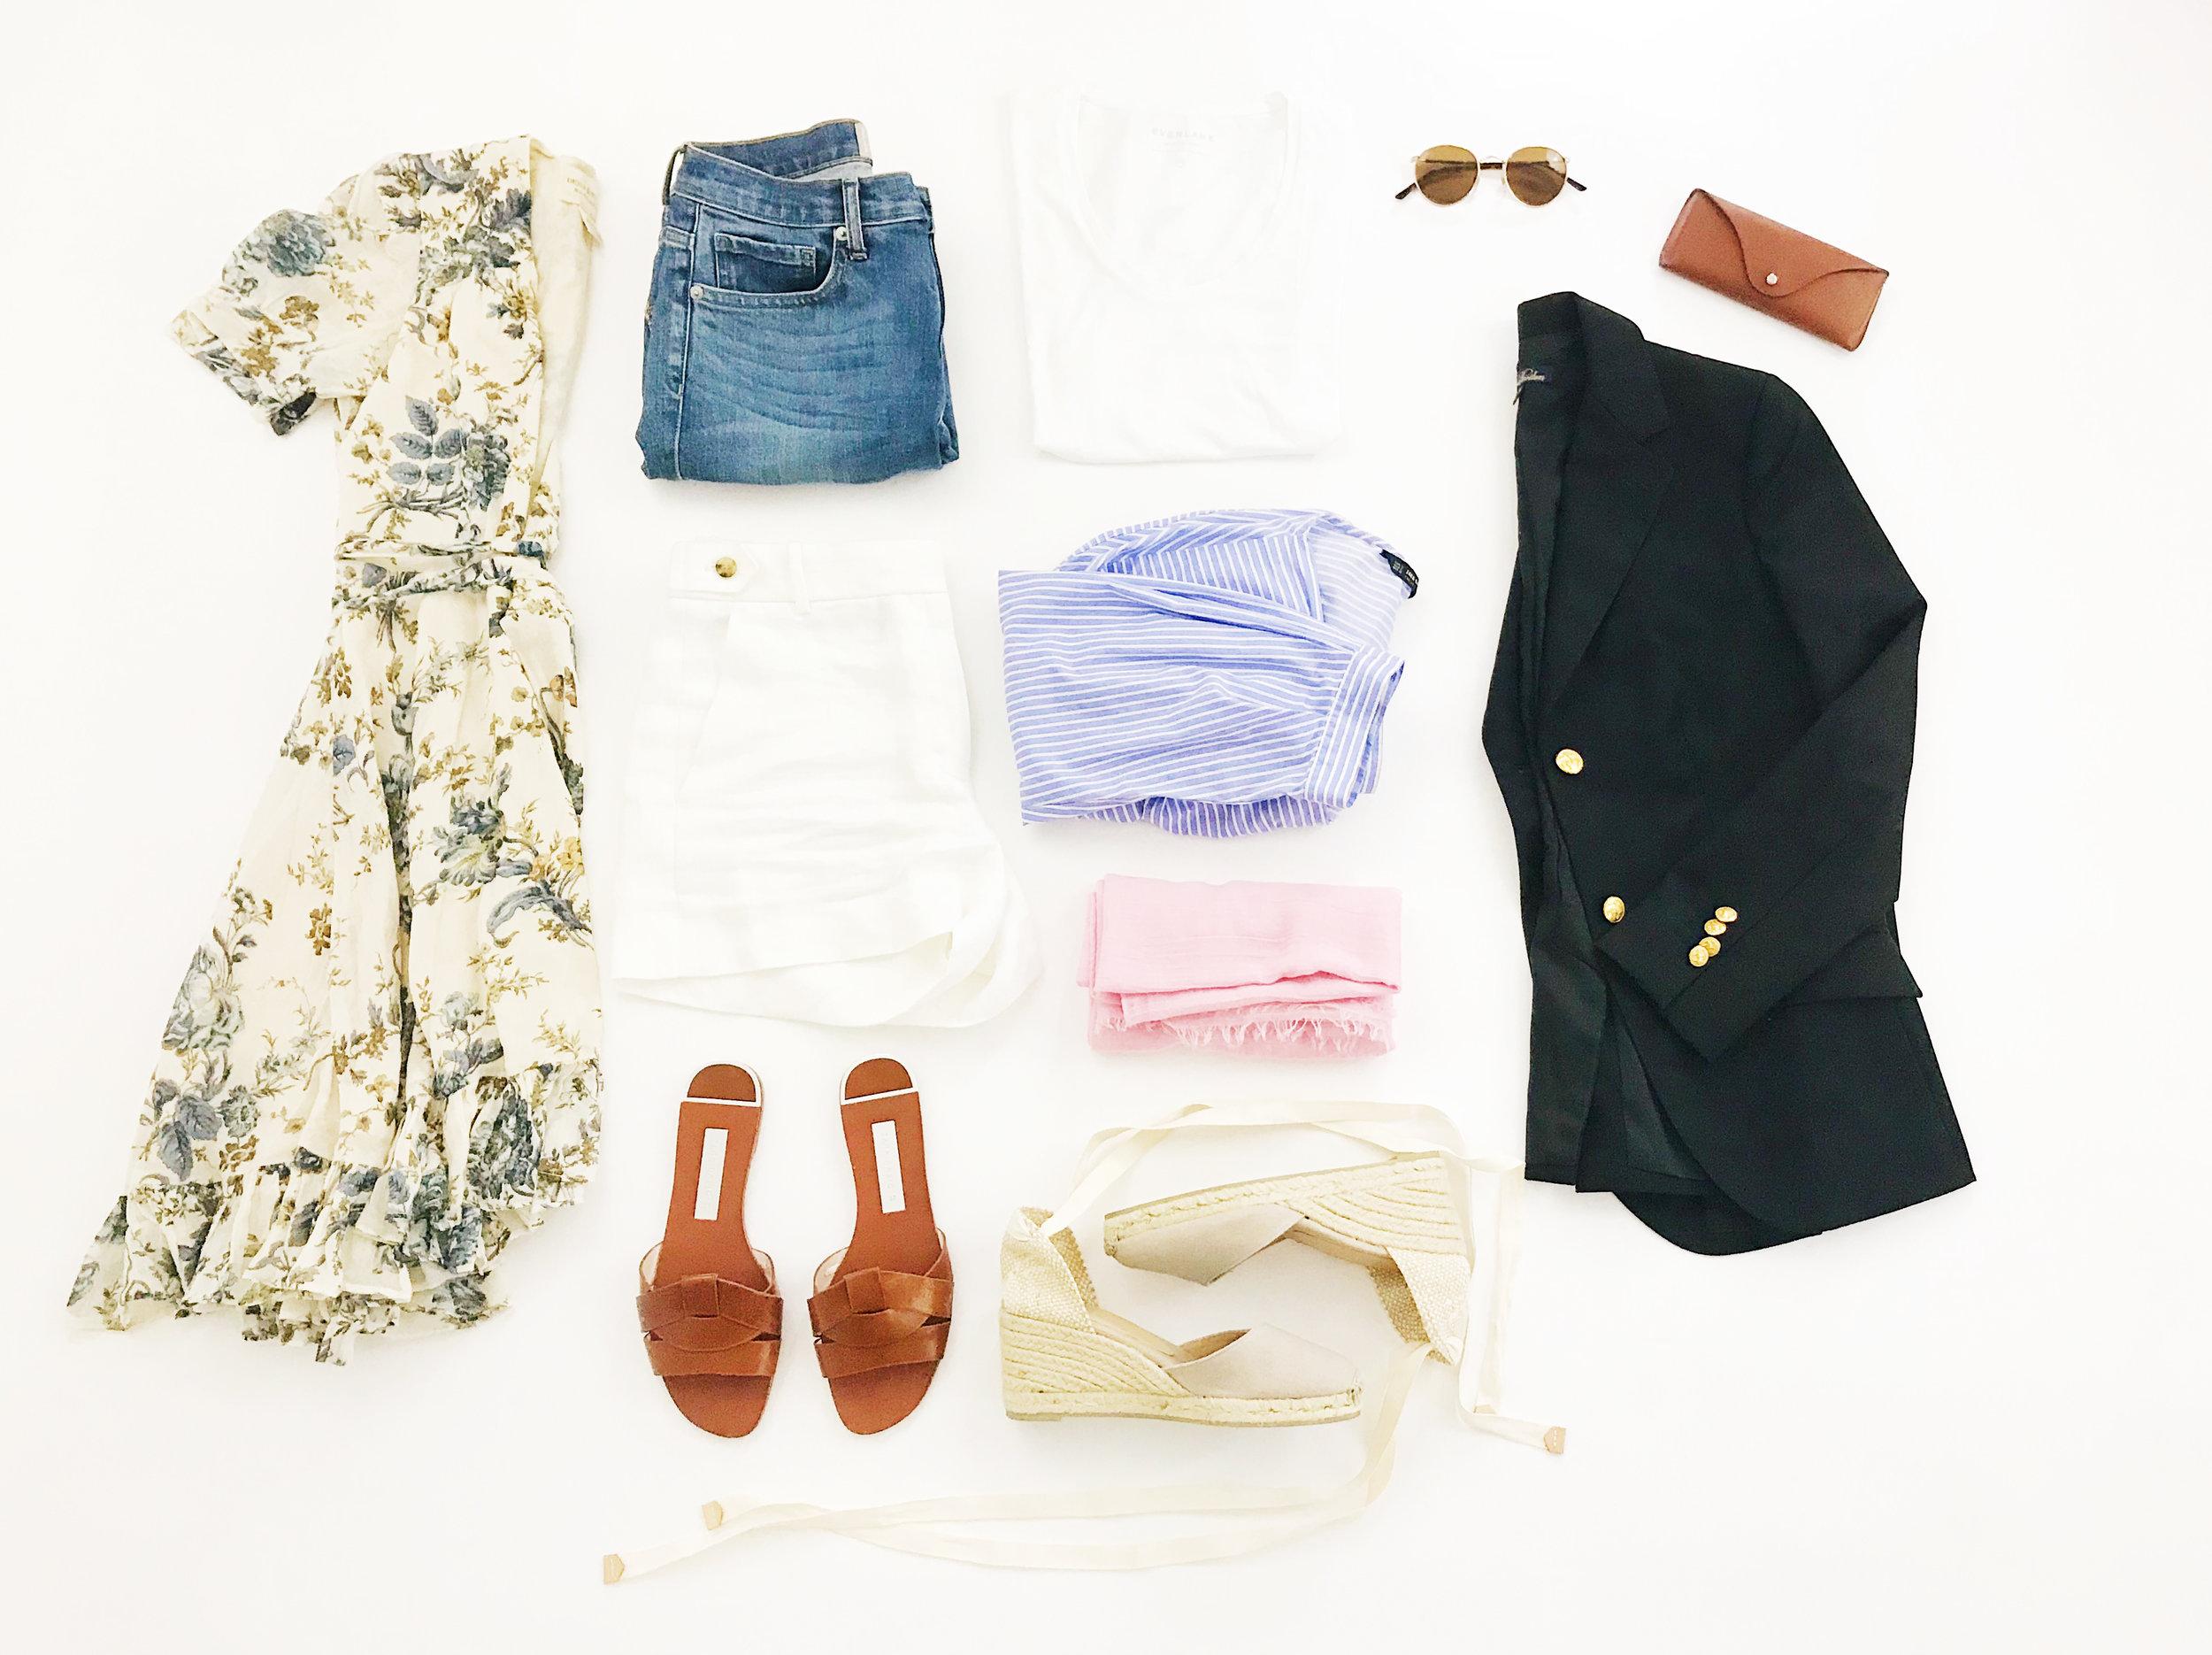 memorial-day-packing-zara-sandals-everlane-jeans-brooks-brothers-navy-blazer-wrap-dress-castaner-espadrilles-everlane-cotton-u-neck---.JPG